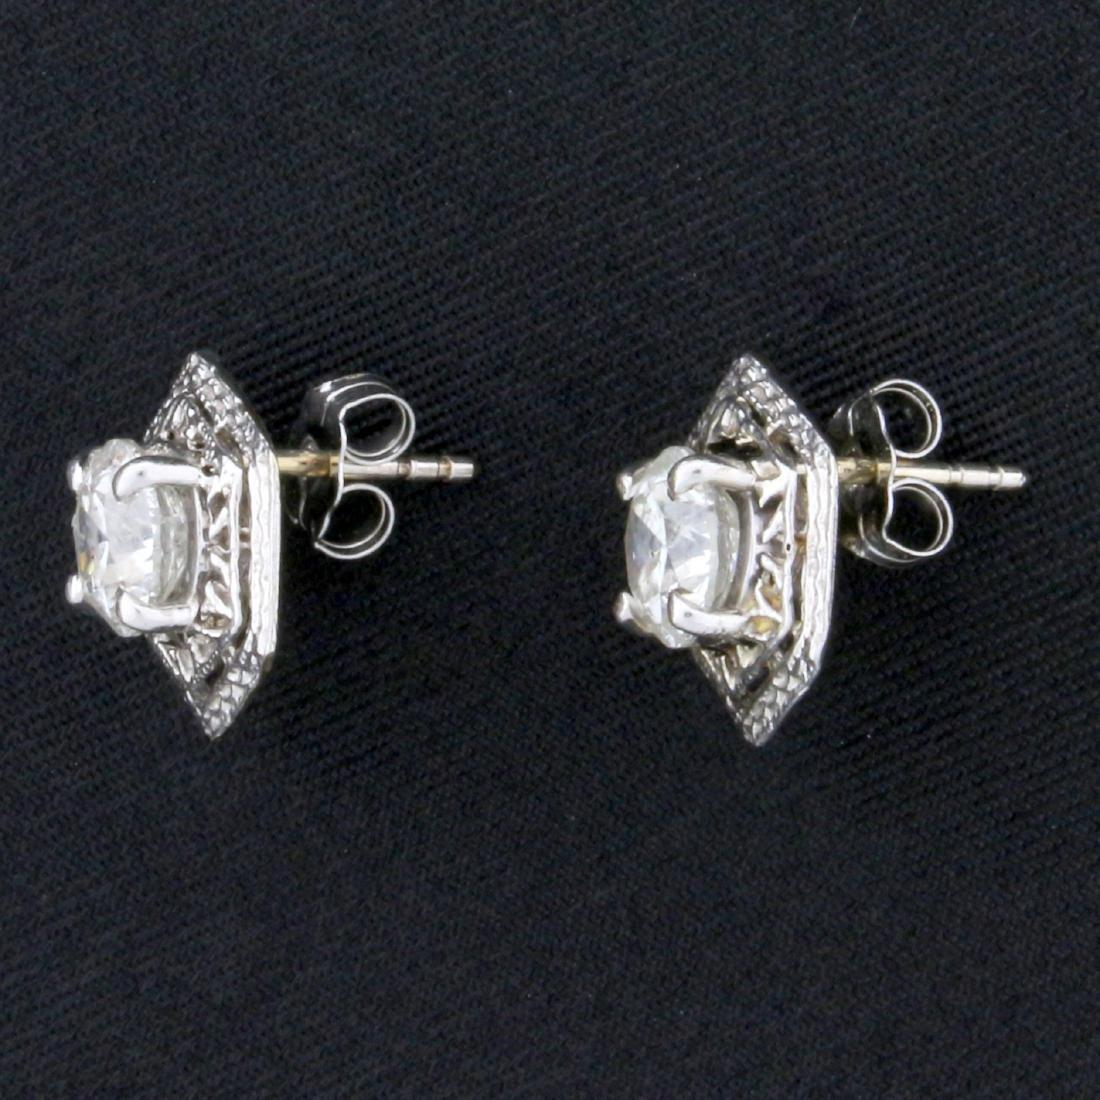 Unique 1.6ct TW Diamond Earrings in 14k White Gold - 2